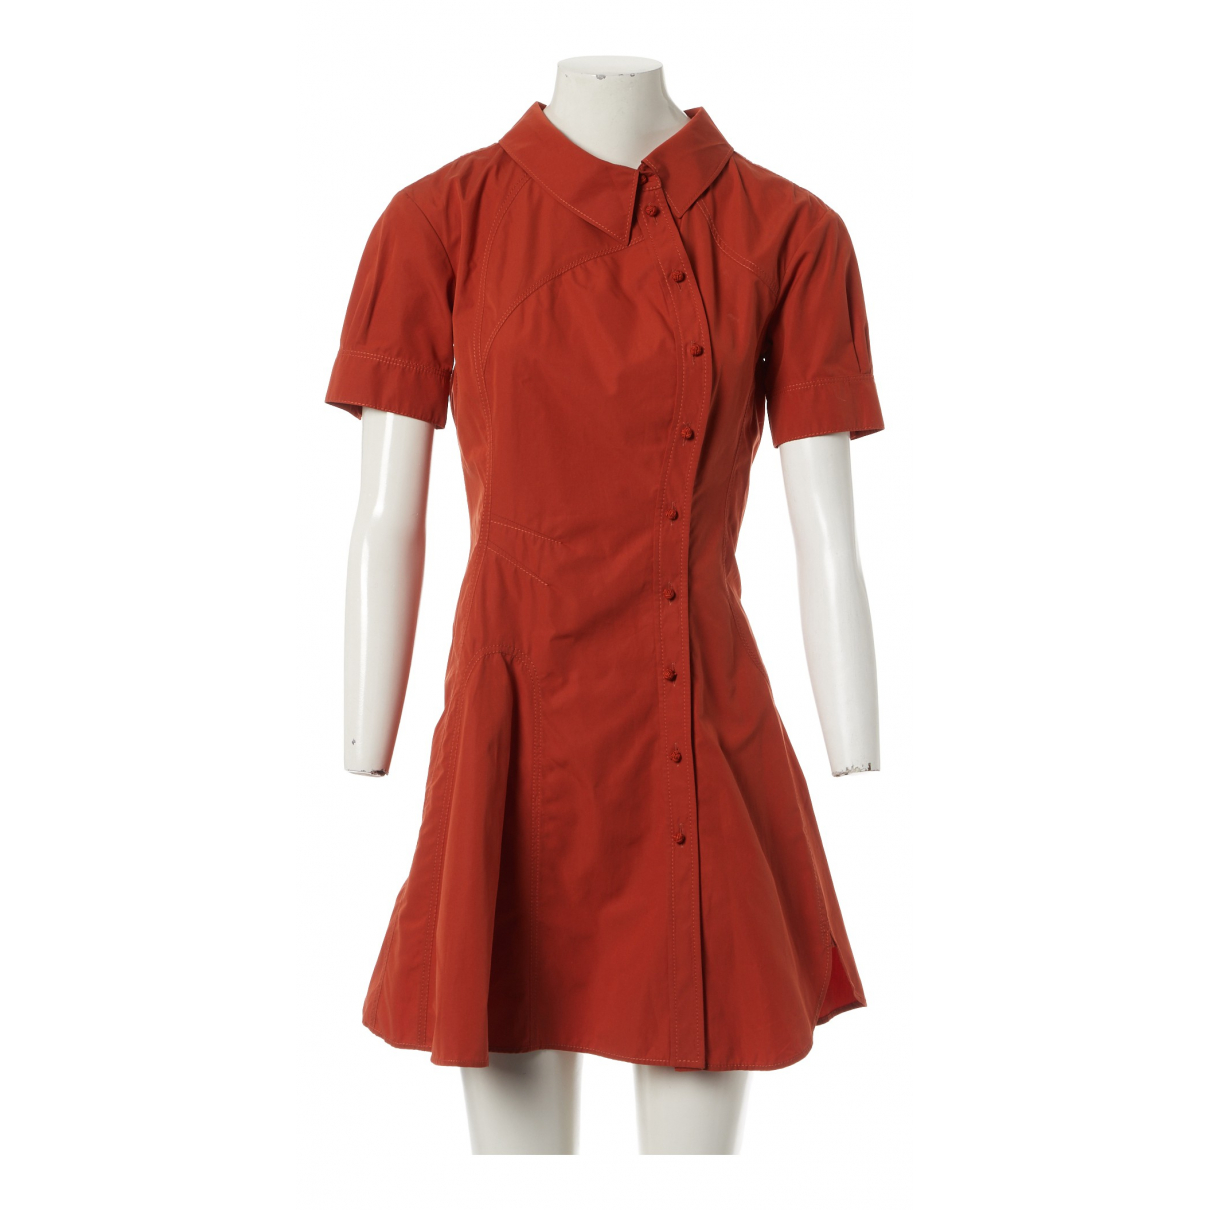 Louis Vuitton N Orange Cotton dress for Women 36 FR